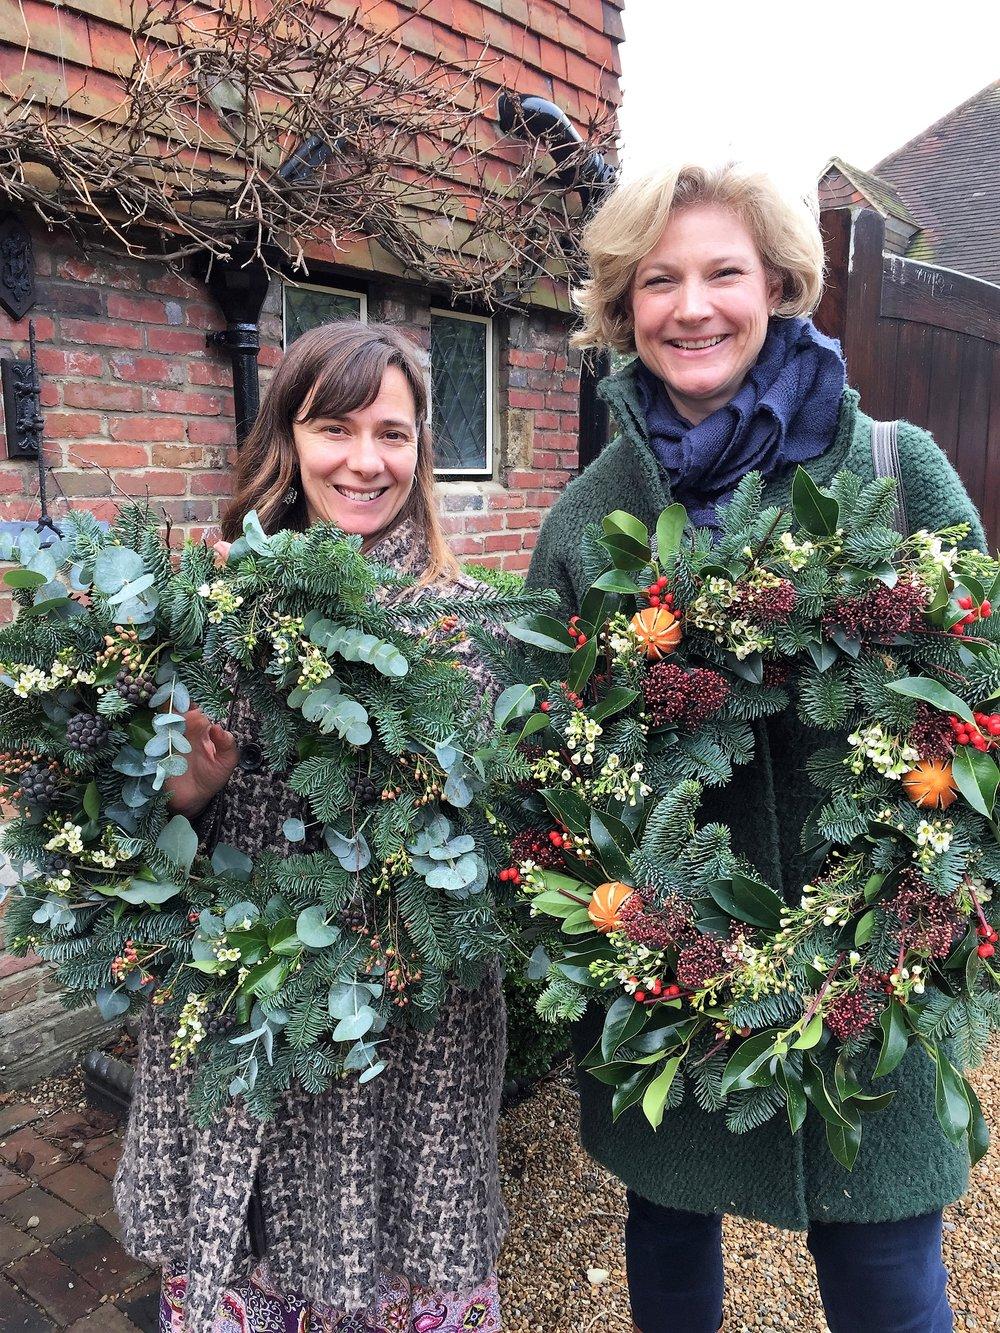 Beautiful abundant Christmas wreaths